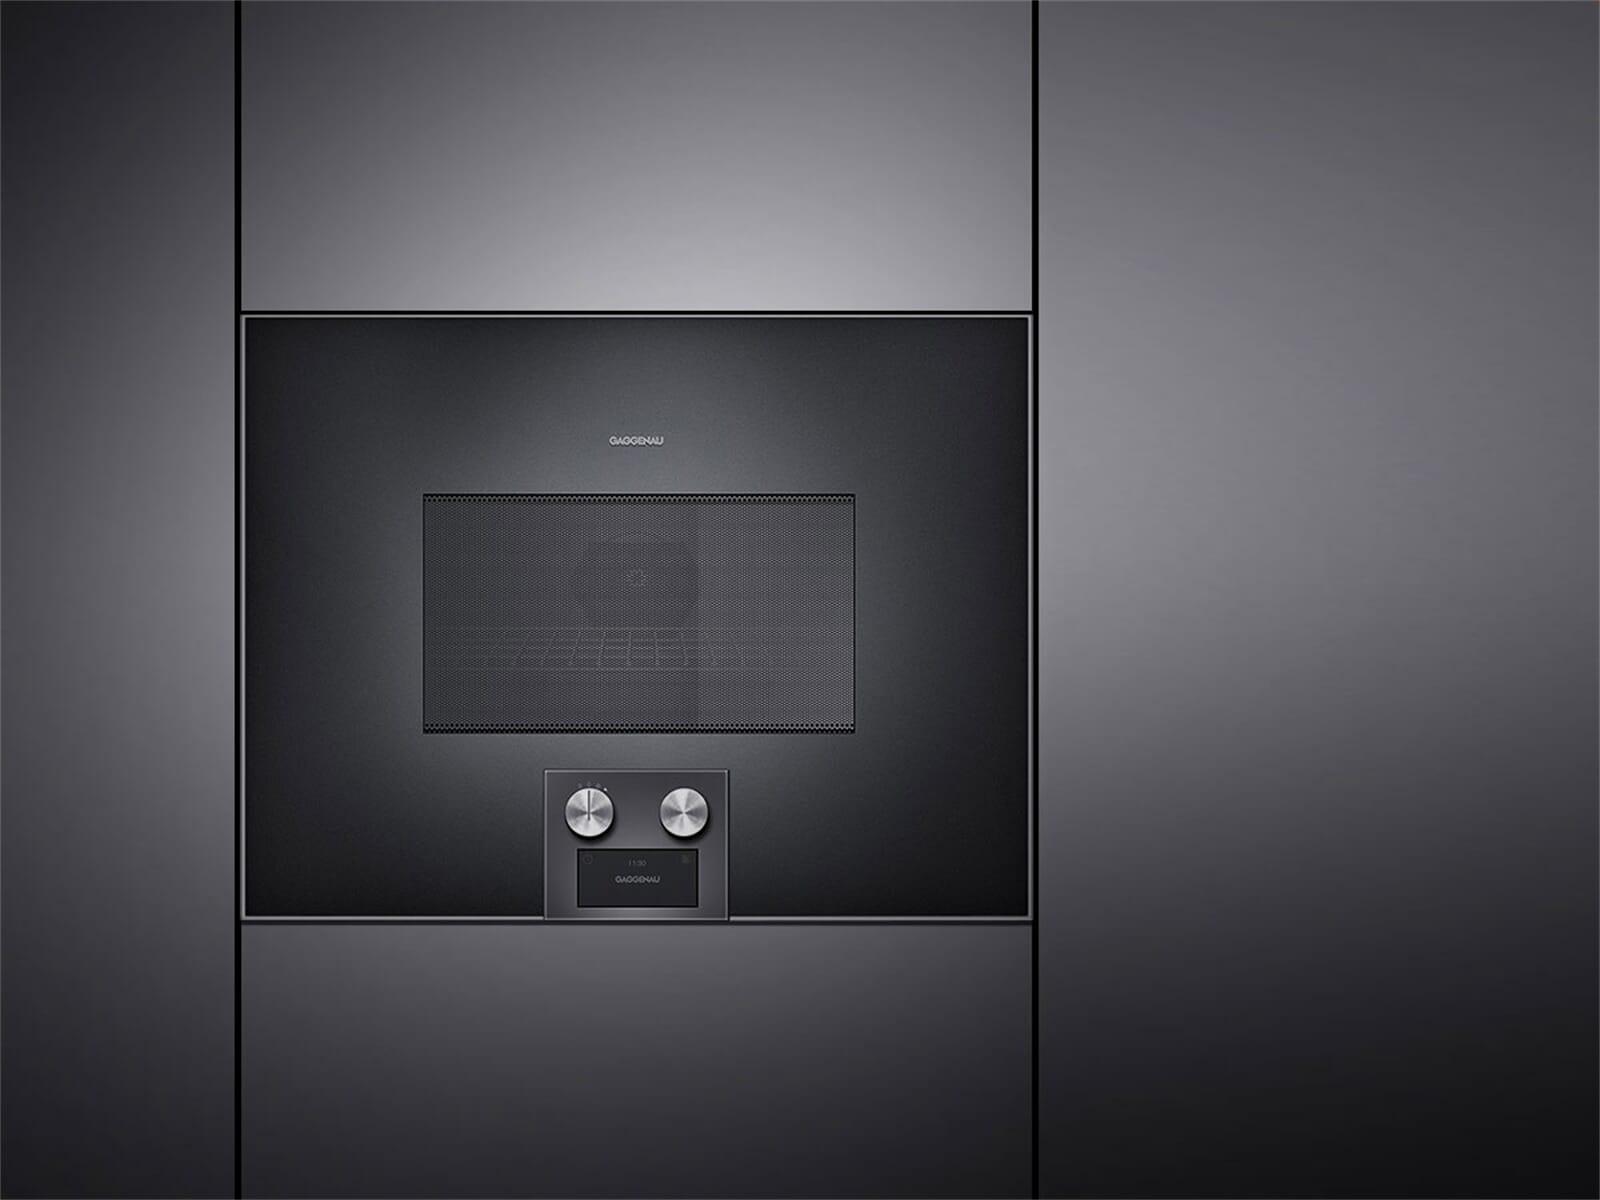 gaggenau bm 455 100 mikrowellen backofen serie 400 anthrazit. Black Bedroom Furniture Sets. Home Design Ideas